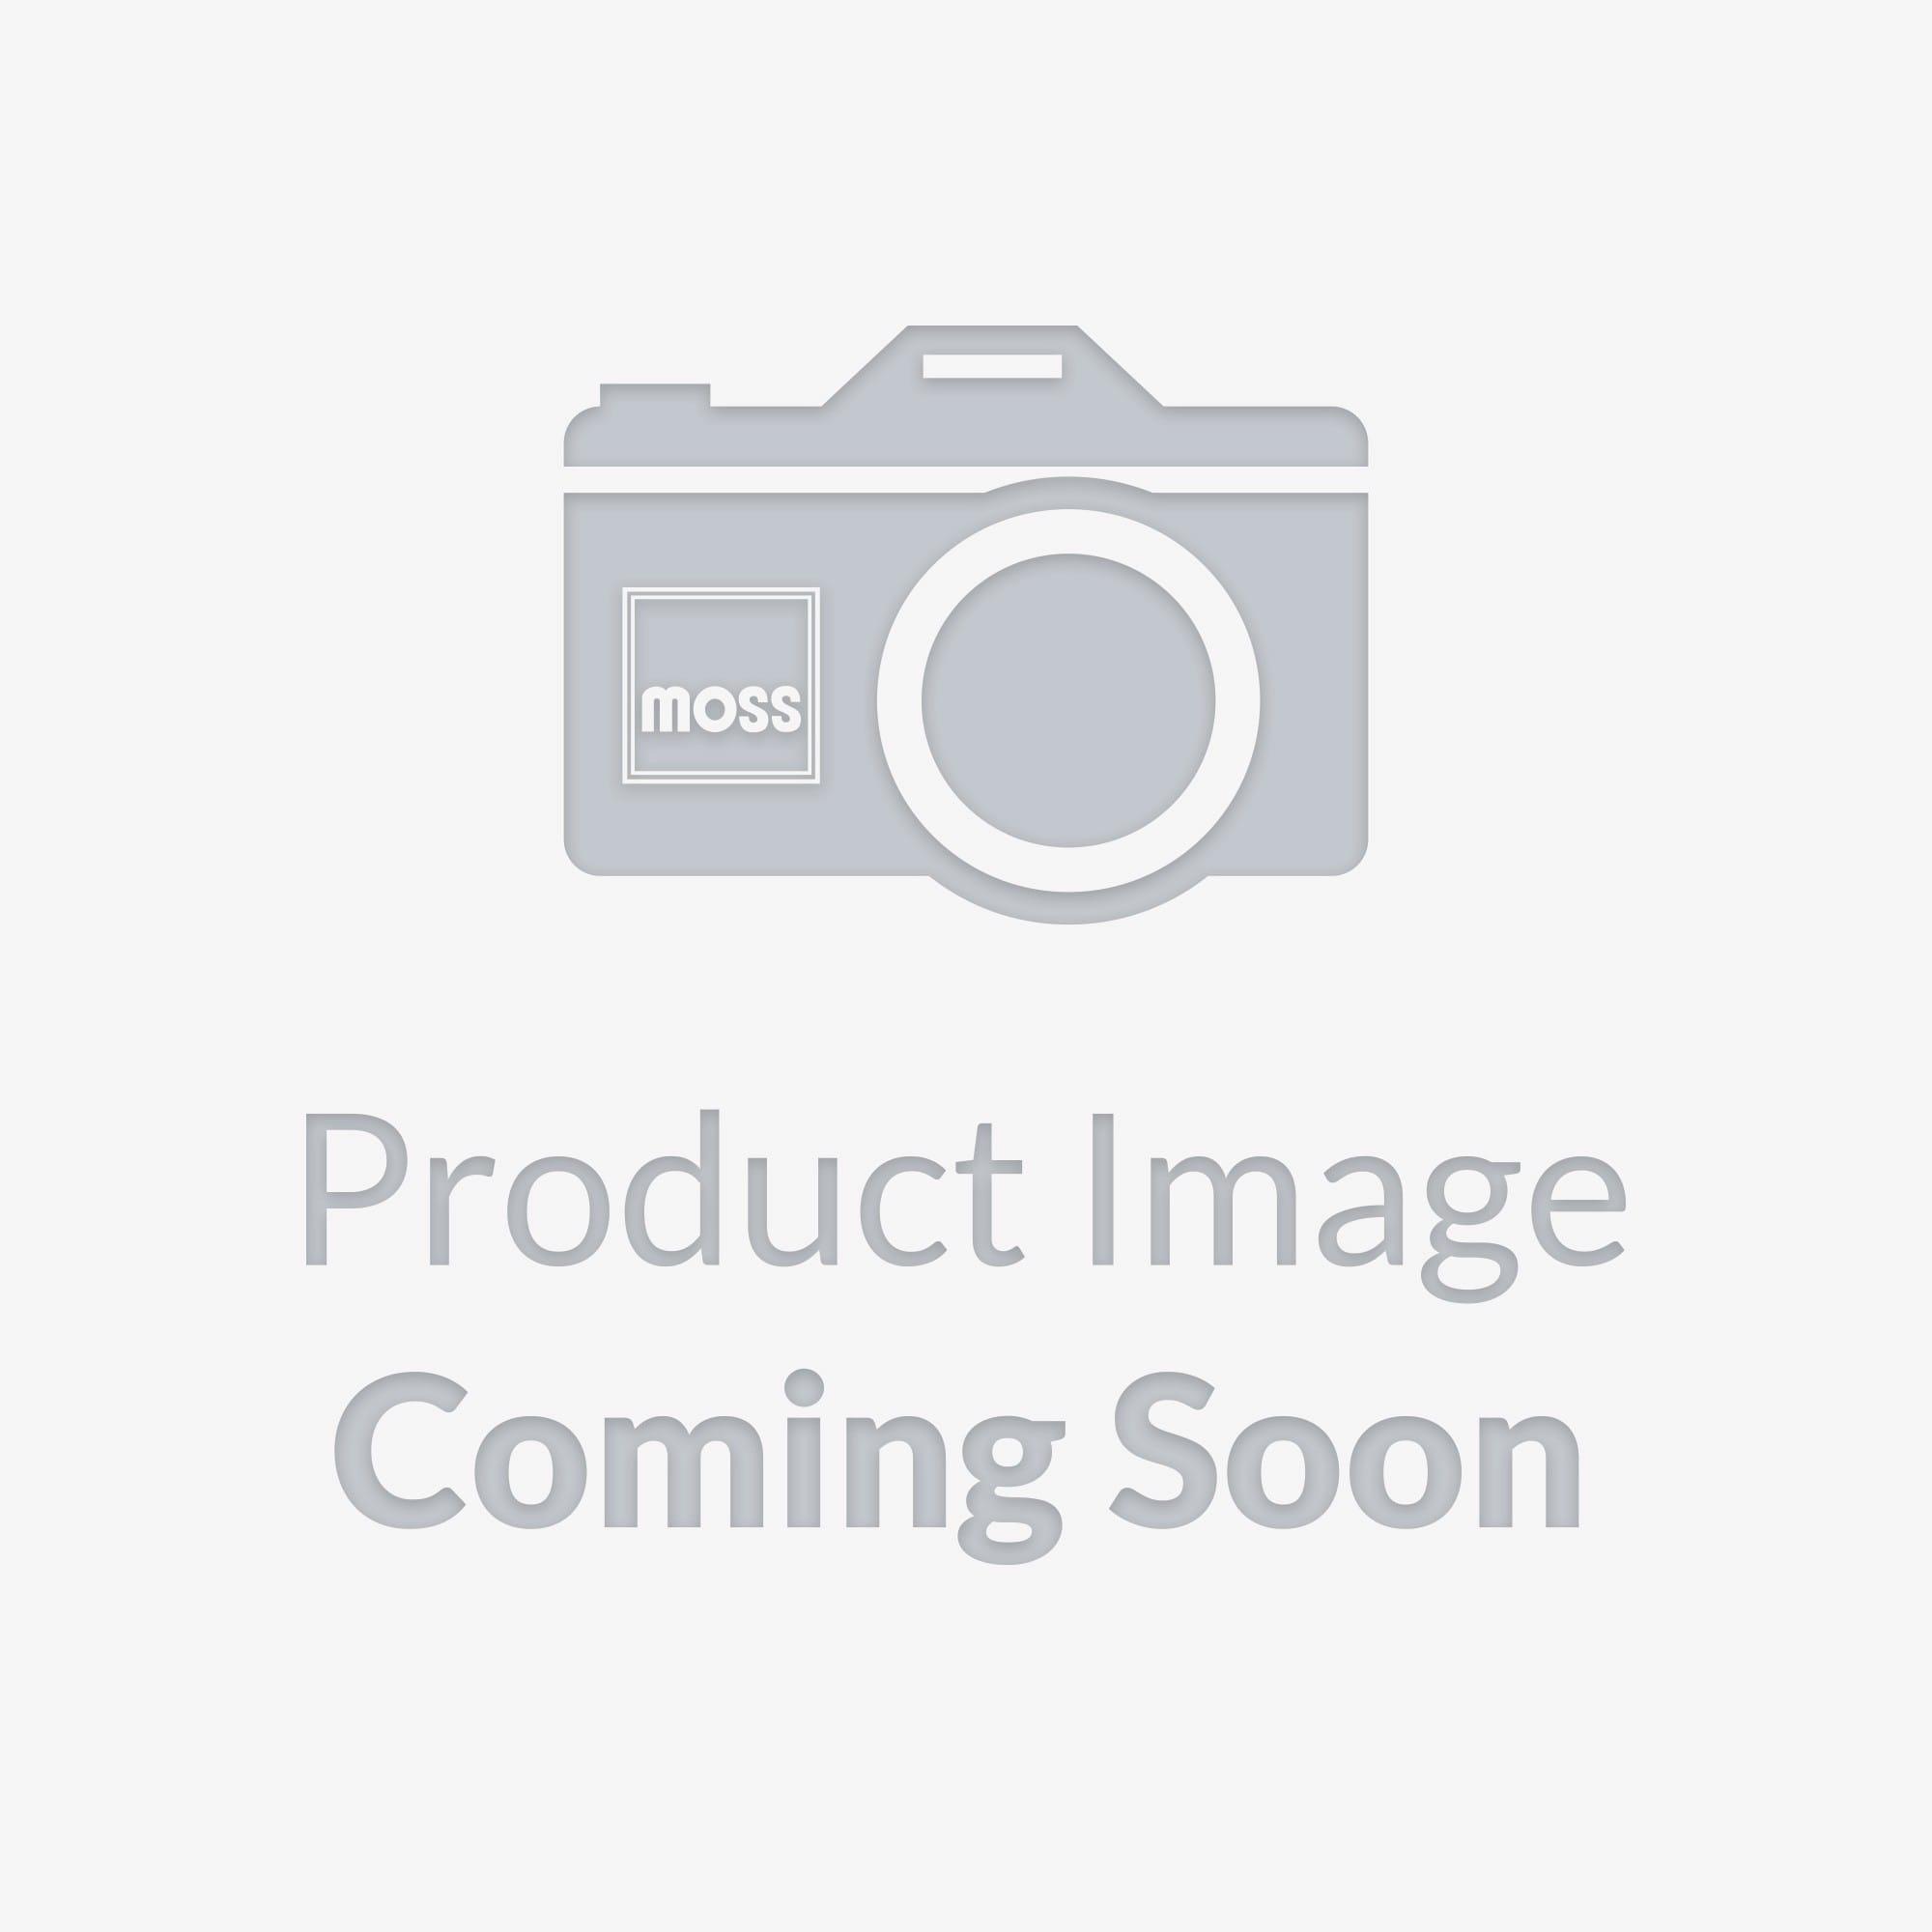 MG MIDGET SHOP RESTORATION MANUAL BOOK HEALEY SPRITE HOW TO RESTORE REPAIR GUIDE